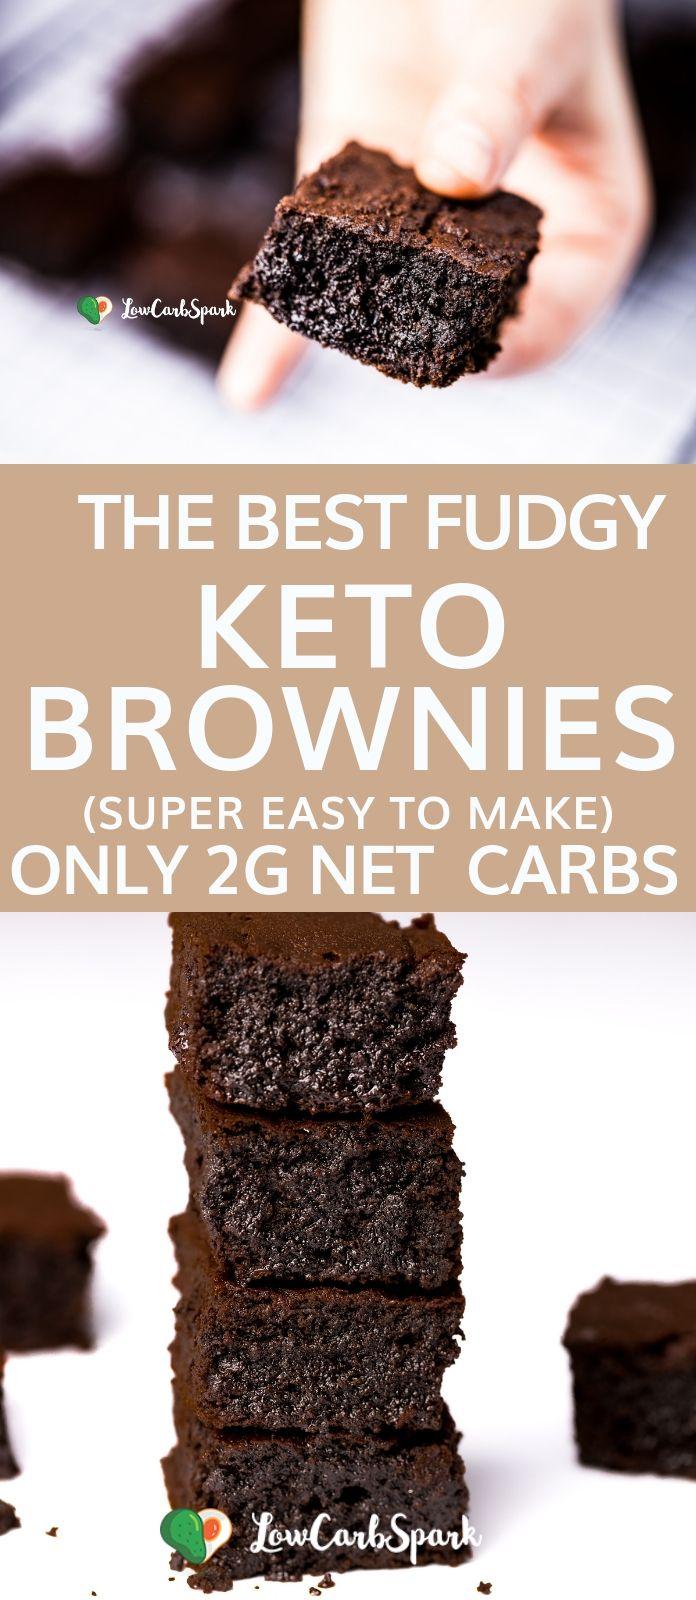 The Best Fudgy Keto Brownies Recipe Torti Recepti